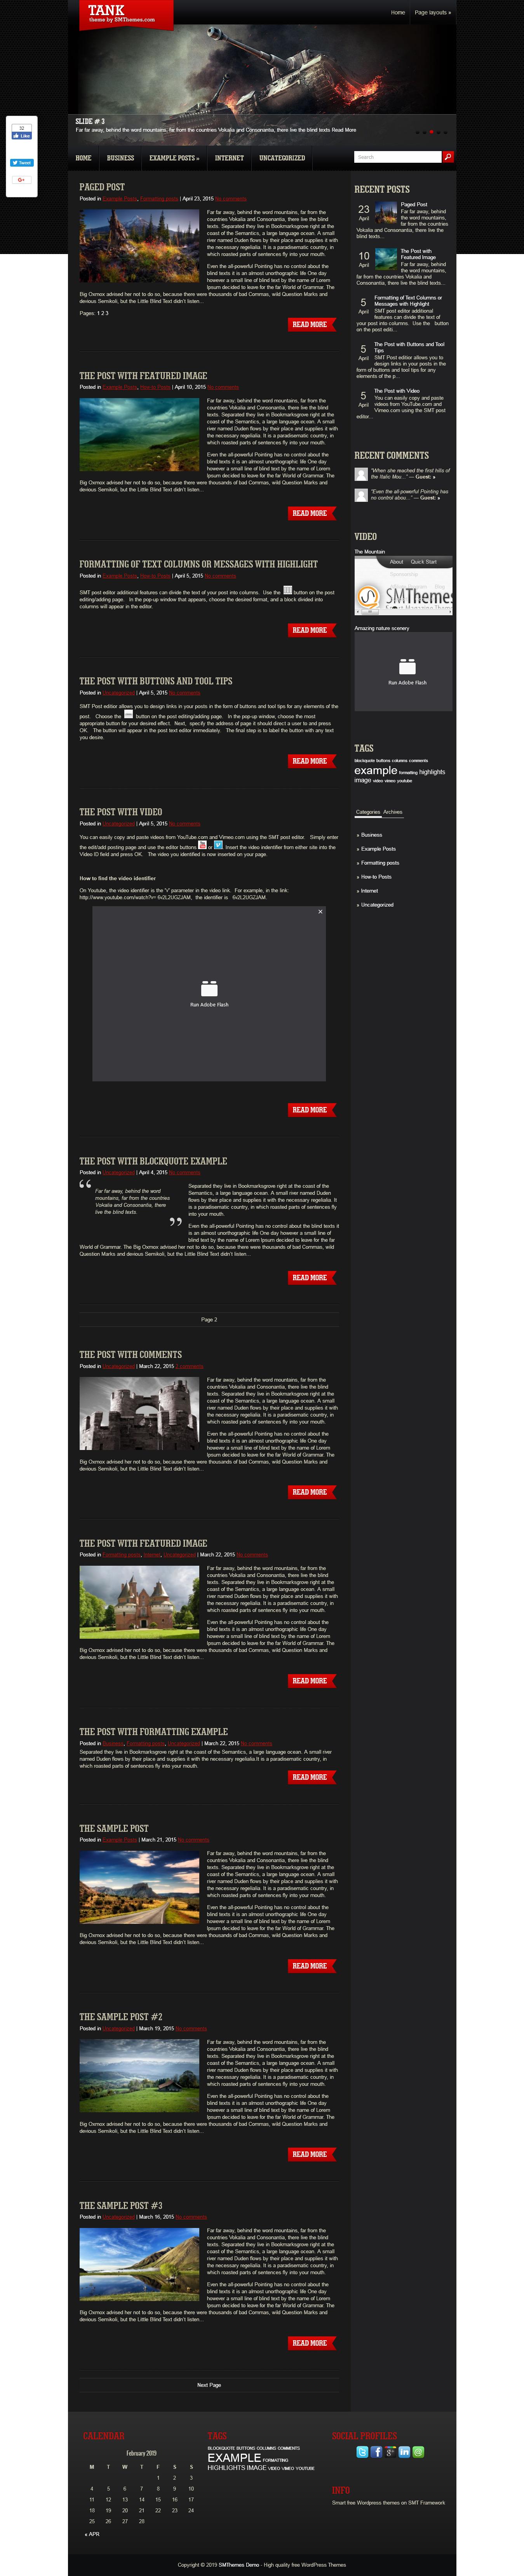 tank best free gaming wordpress theme - 10+ Best Free Gaming WordPress Themes